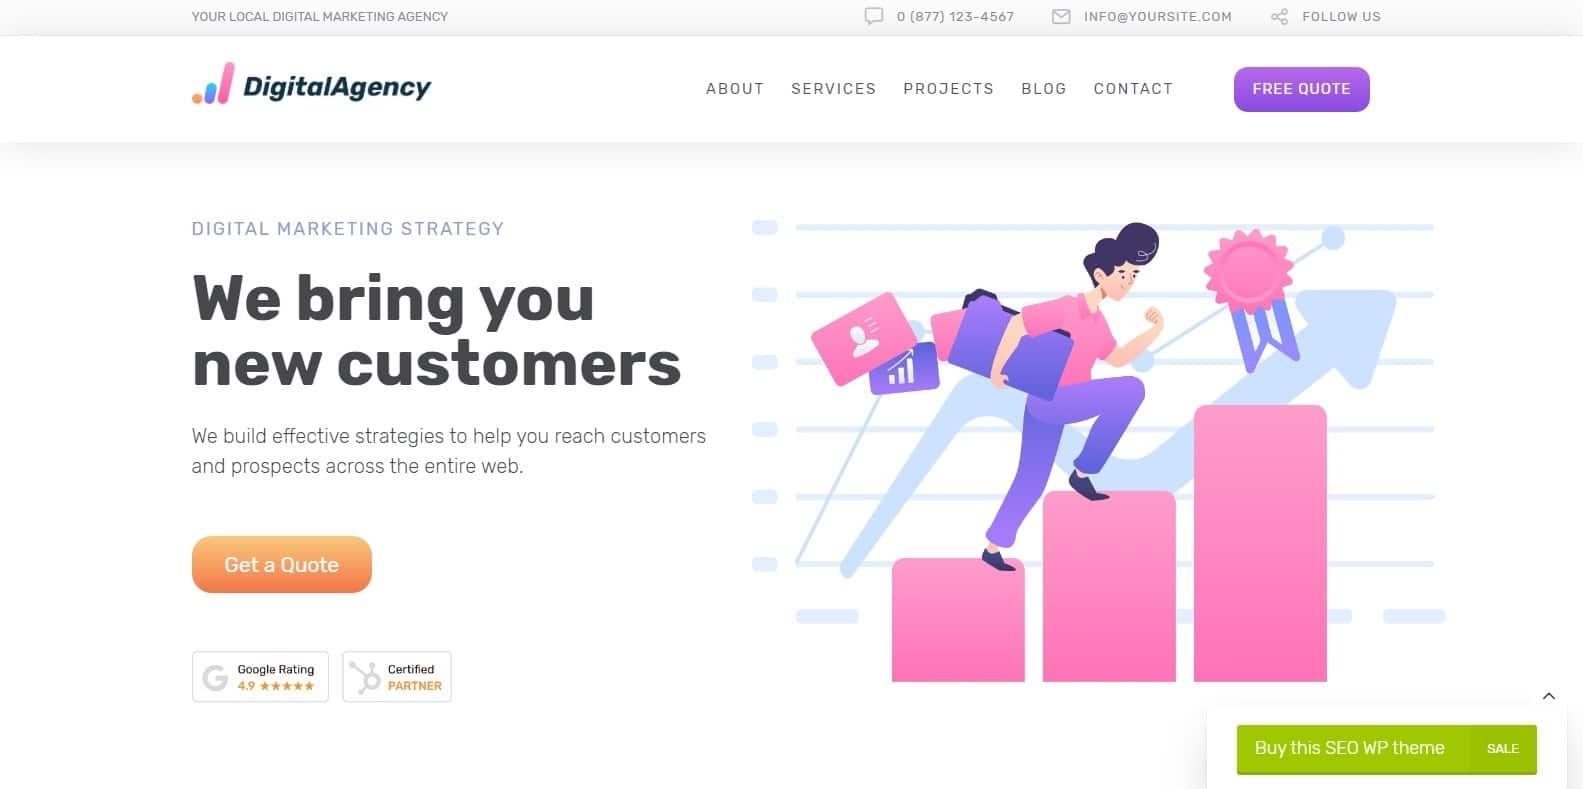 seowp-marketing-website-template